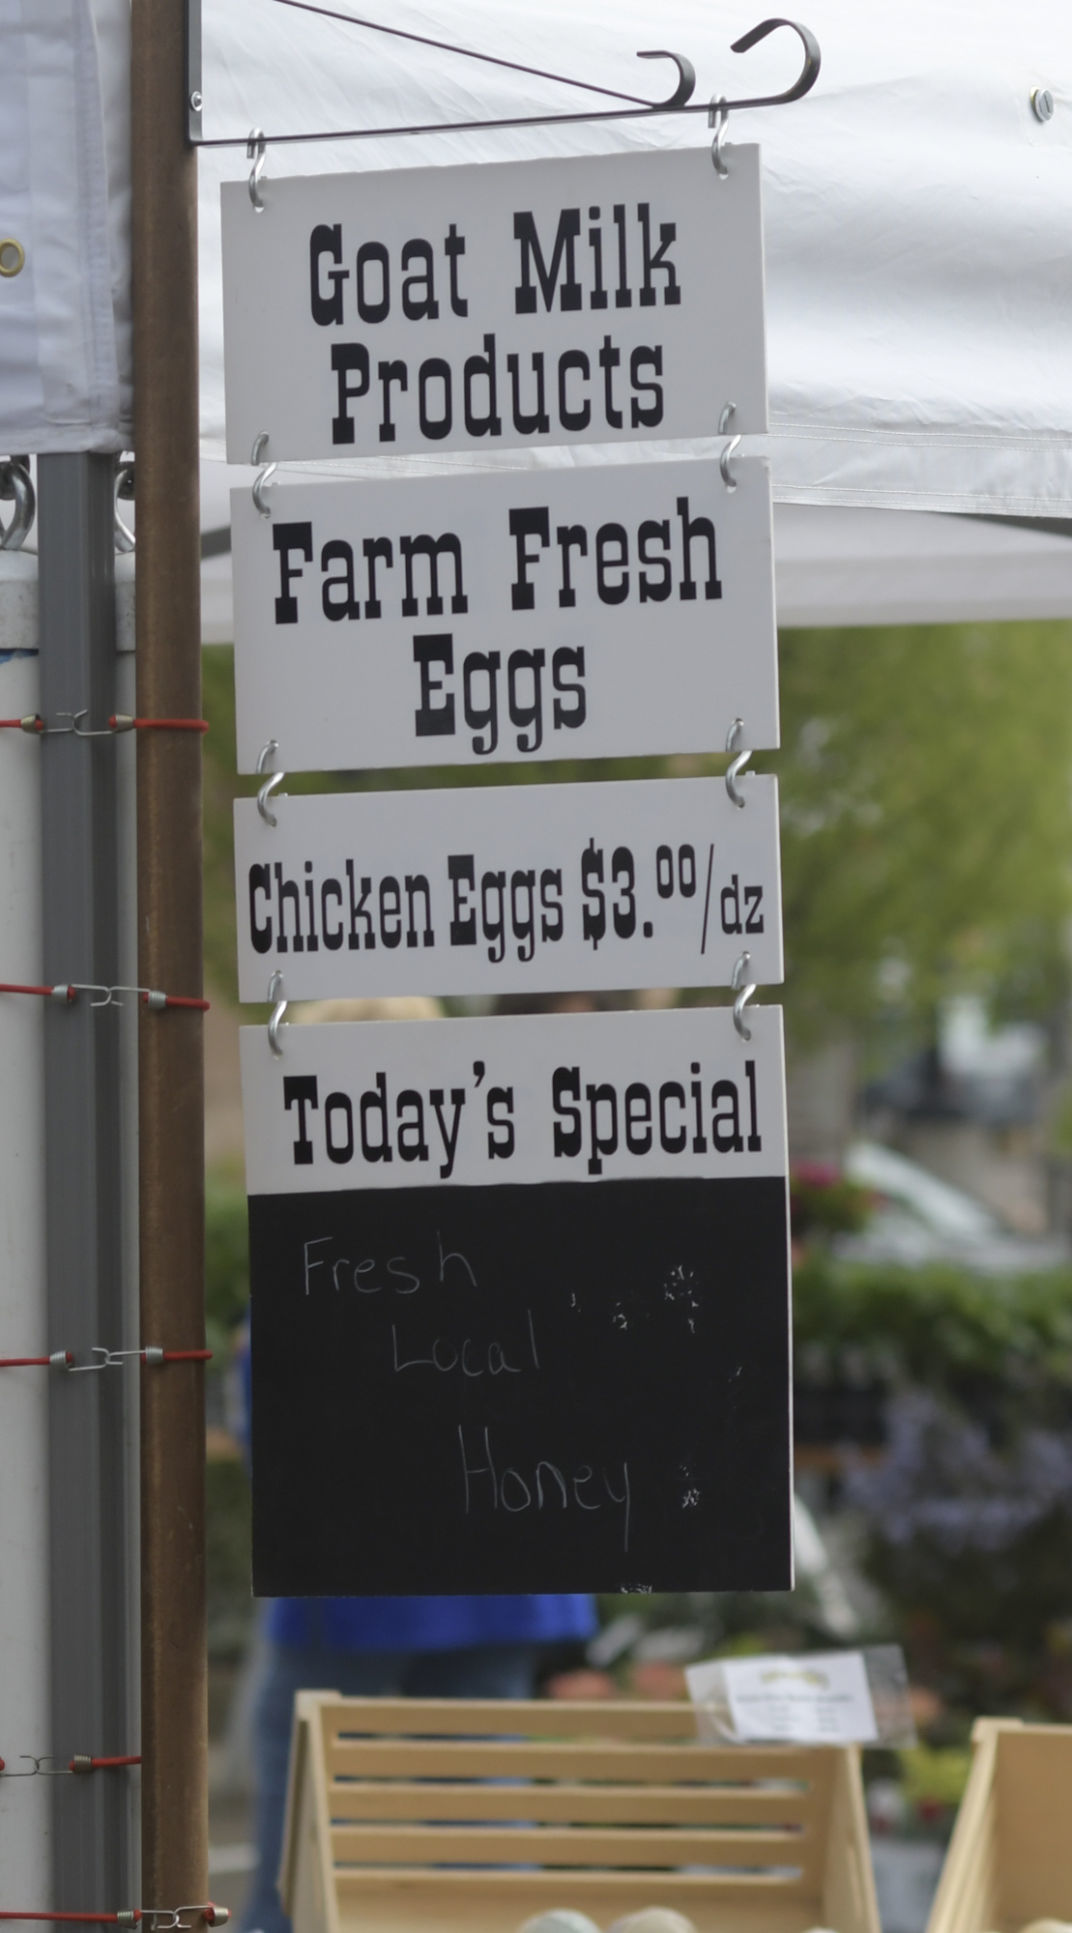 042119-adh-nws-Albany Farmers Market03-my